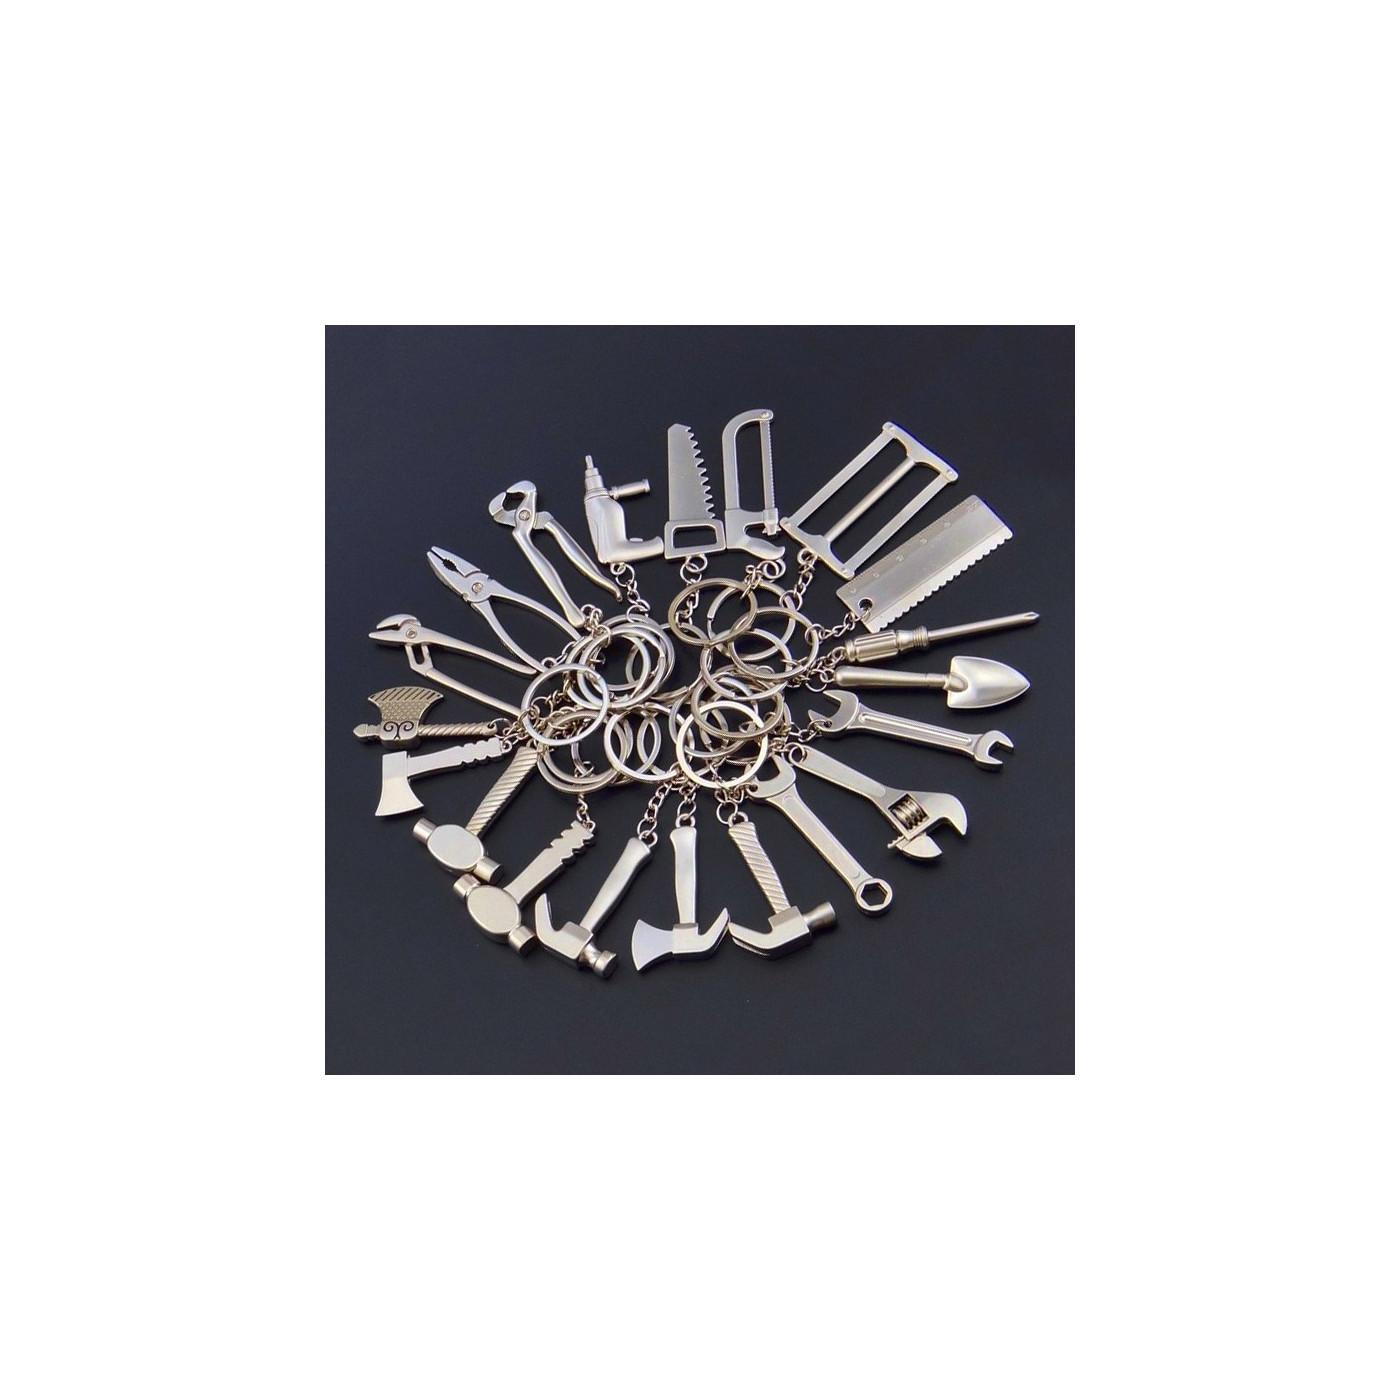 Gift set key ring do it yourself tools (20 pcs)